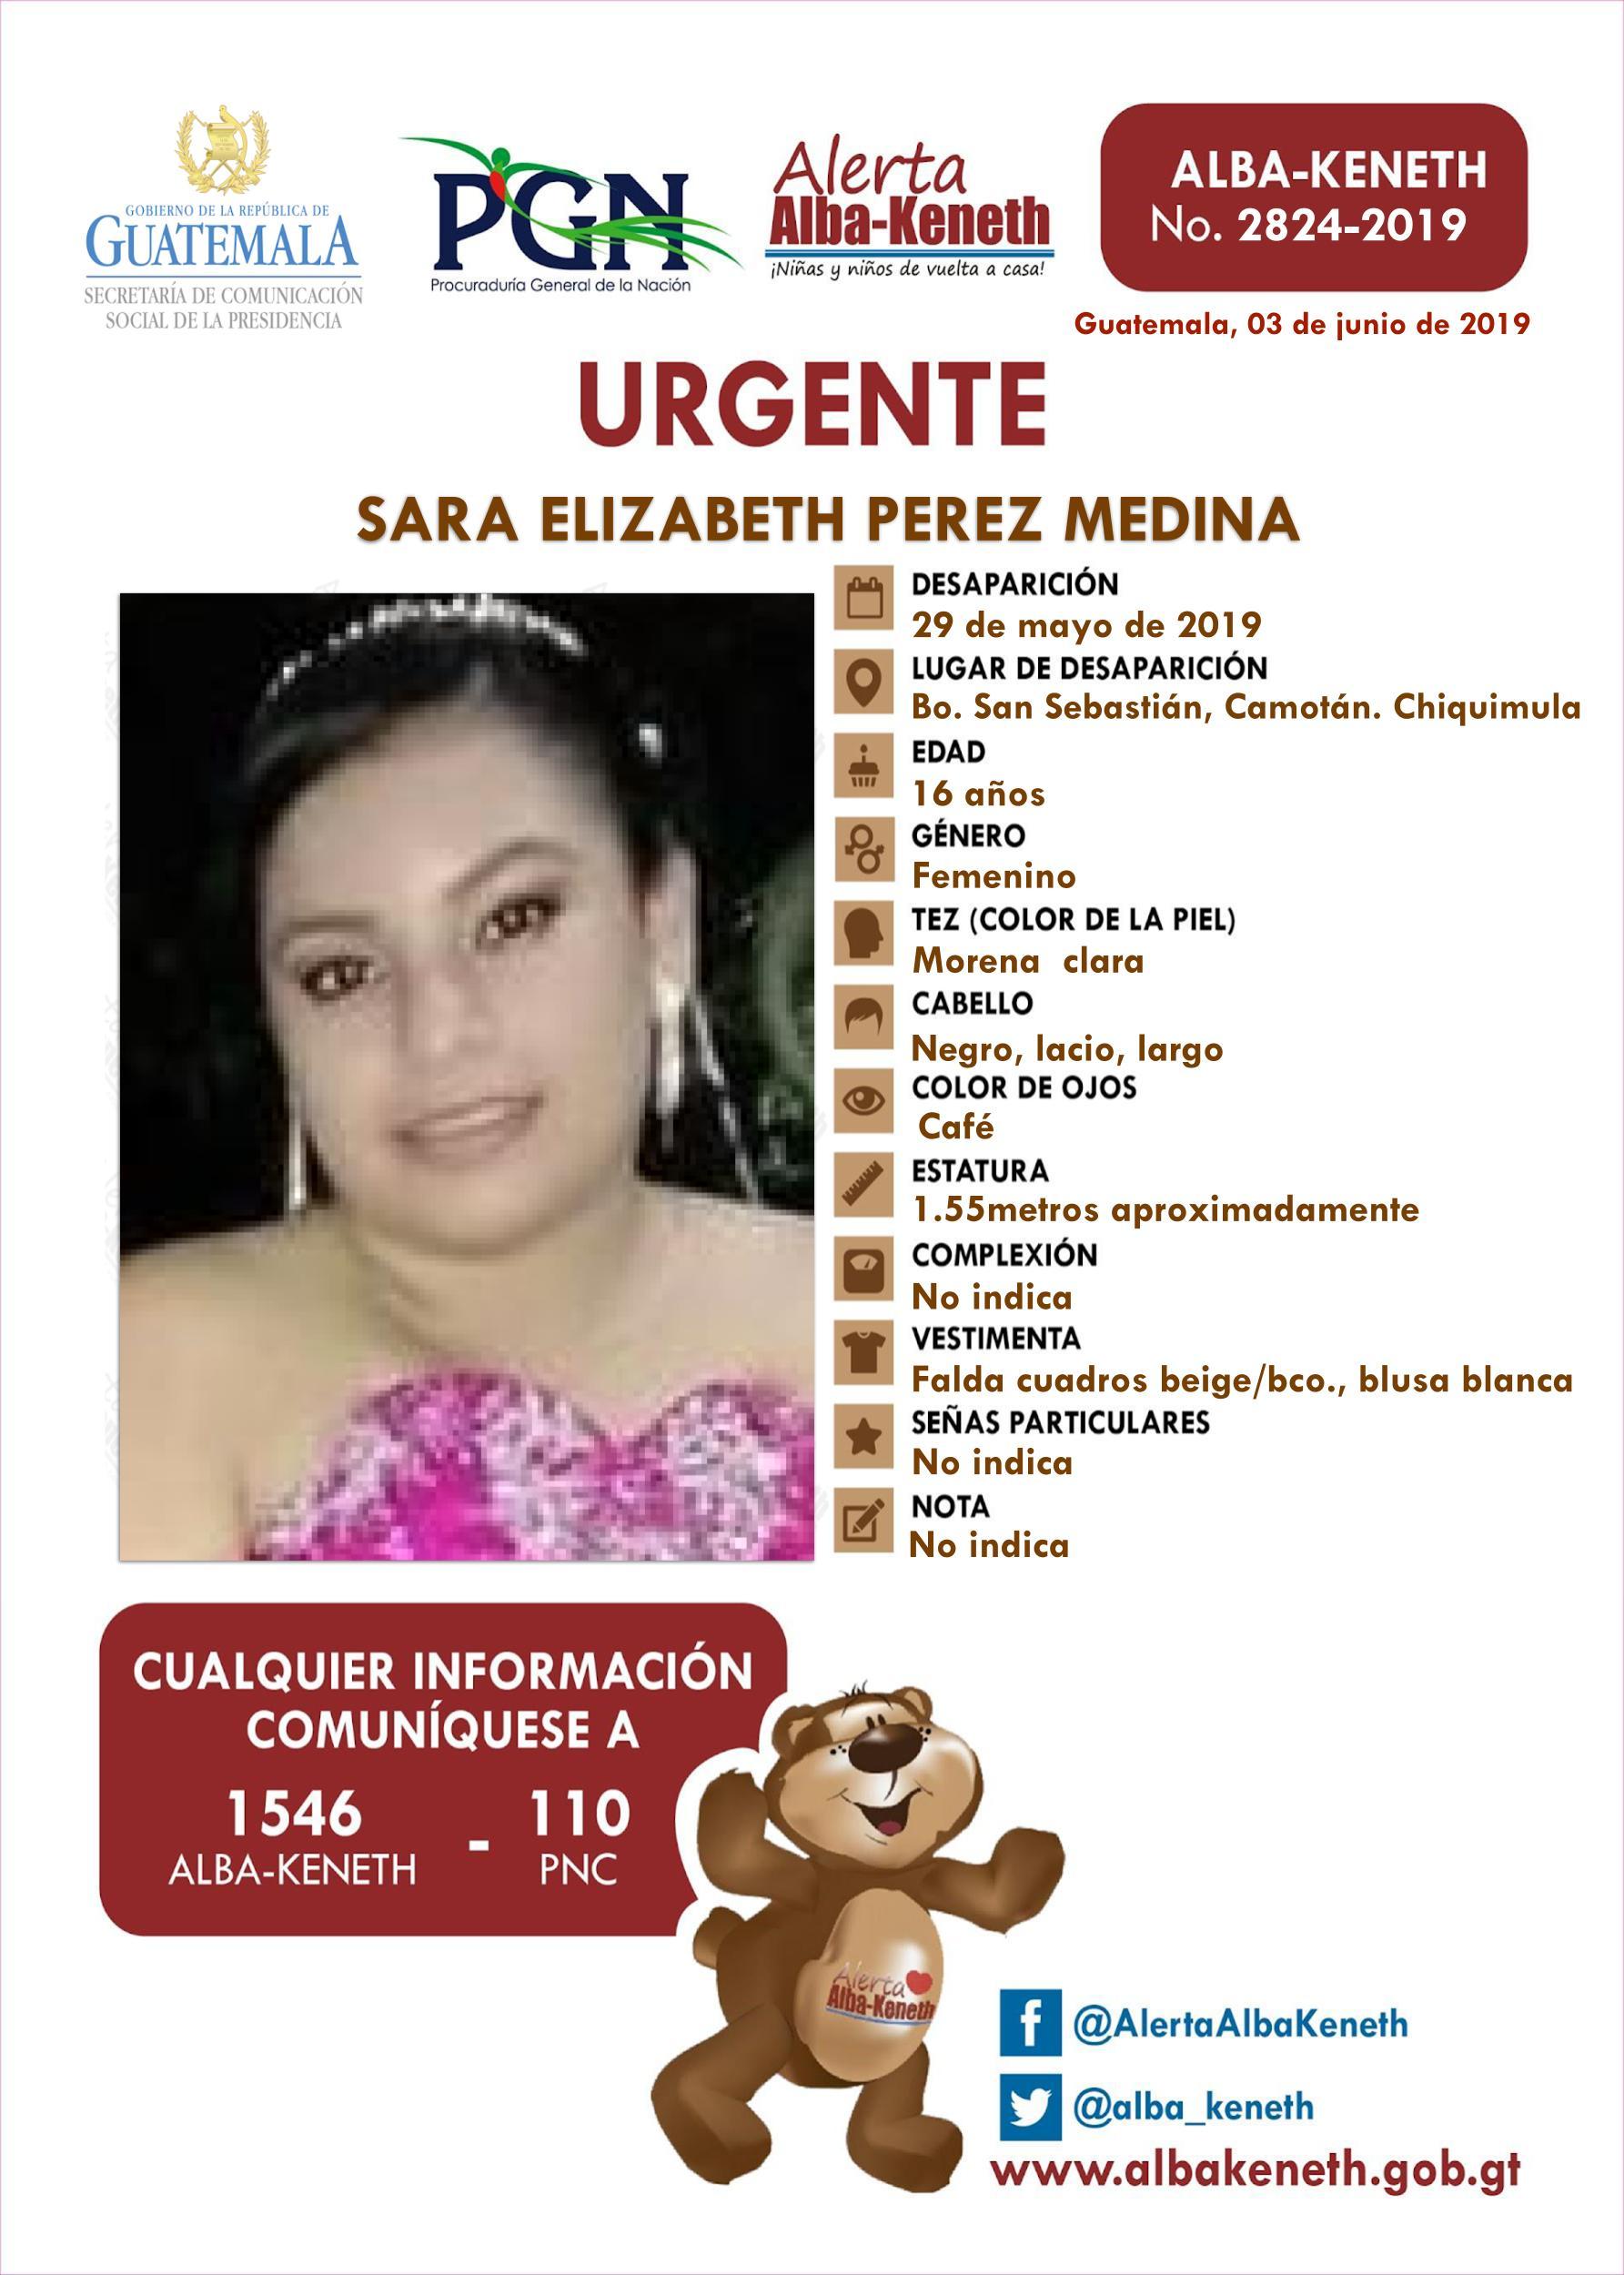 Sara Elizabeth Perez Medina